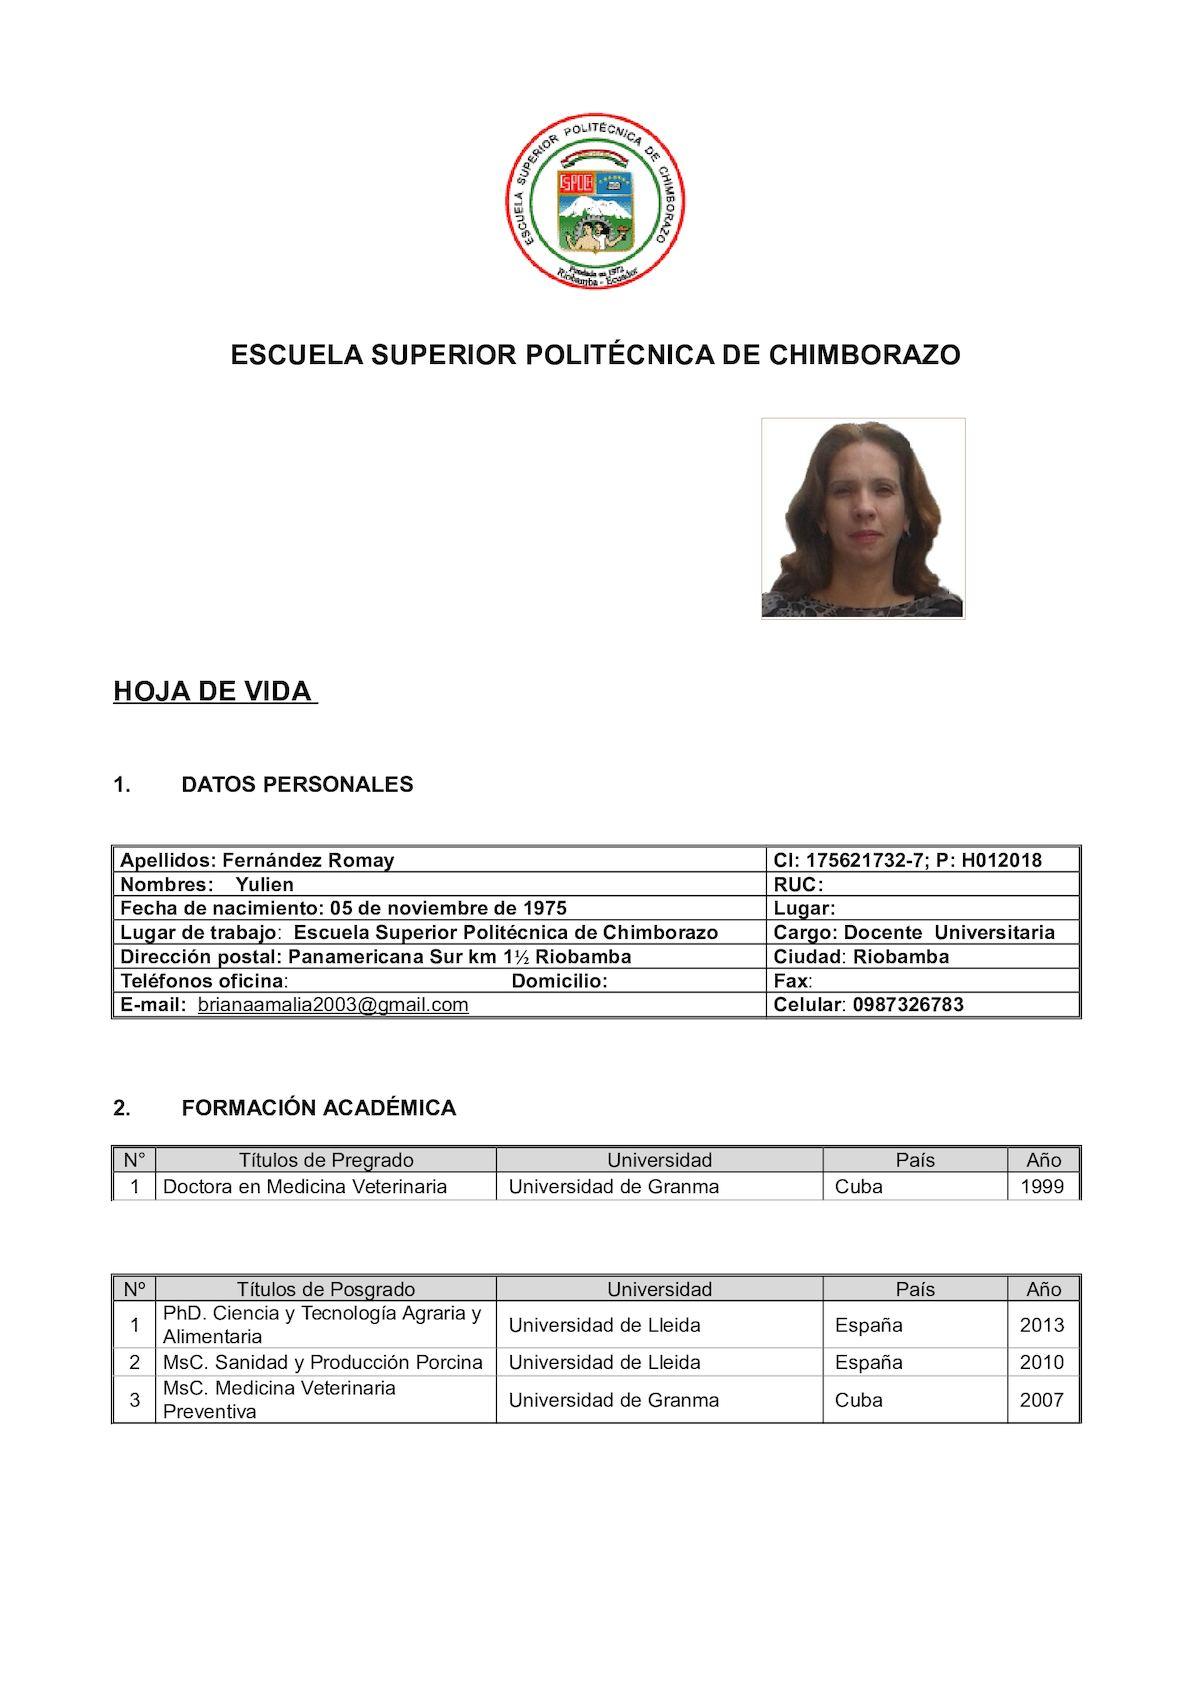 Hoja De Vida Yulien Fernández Romay